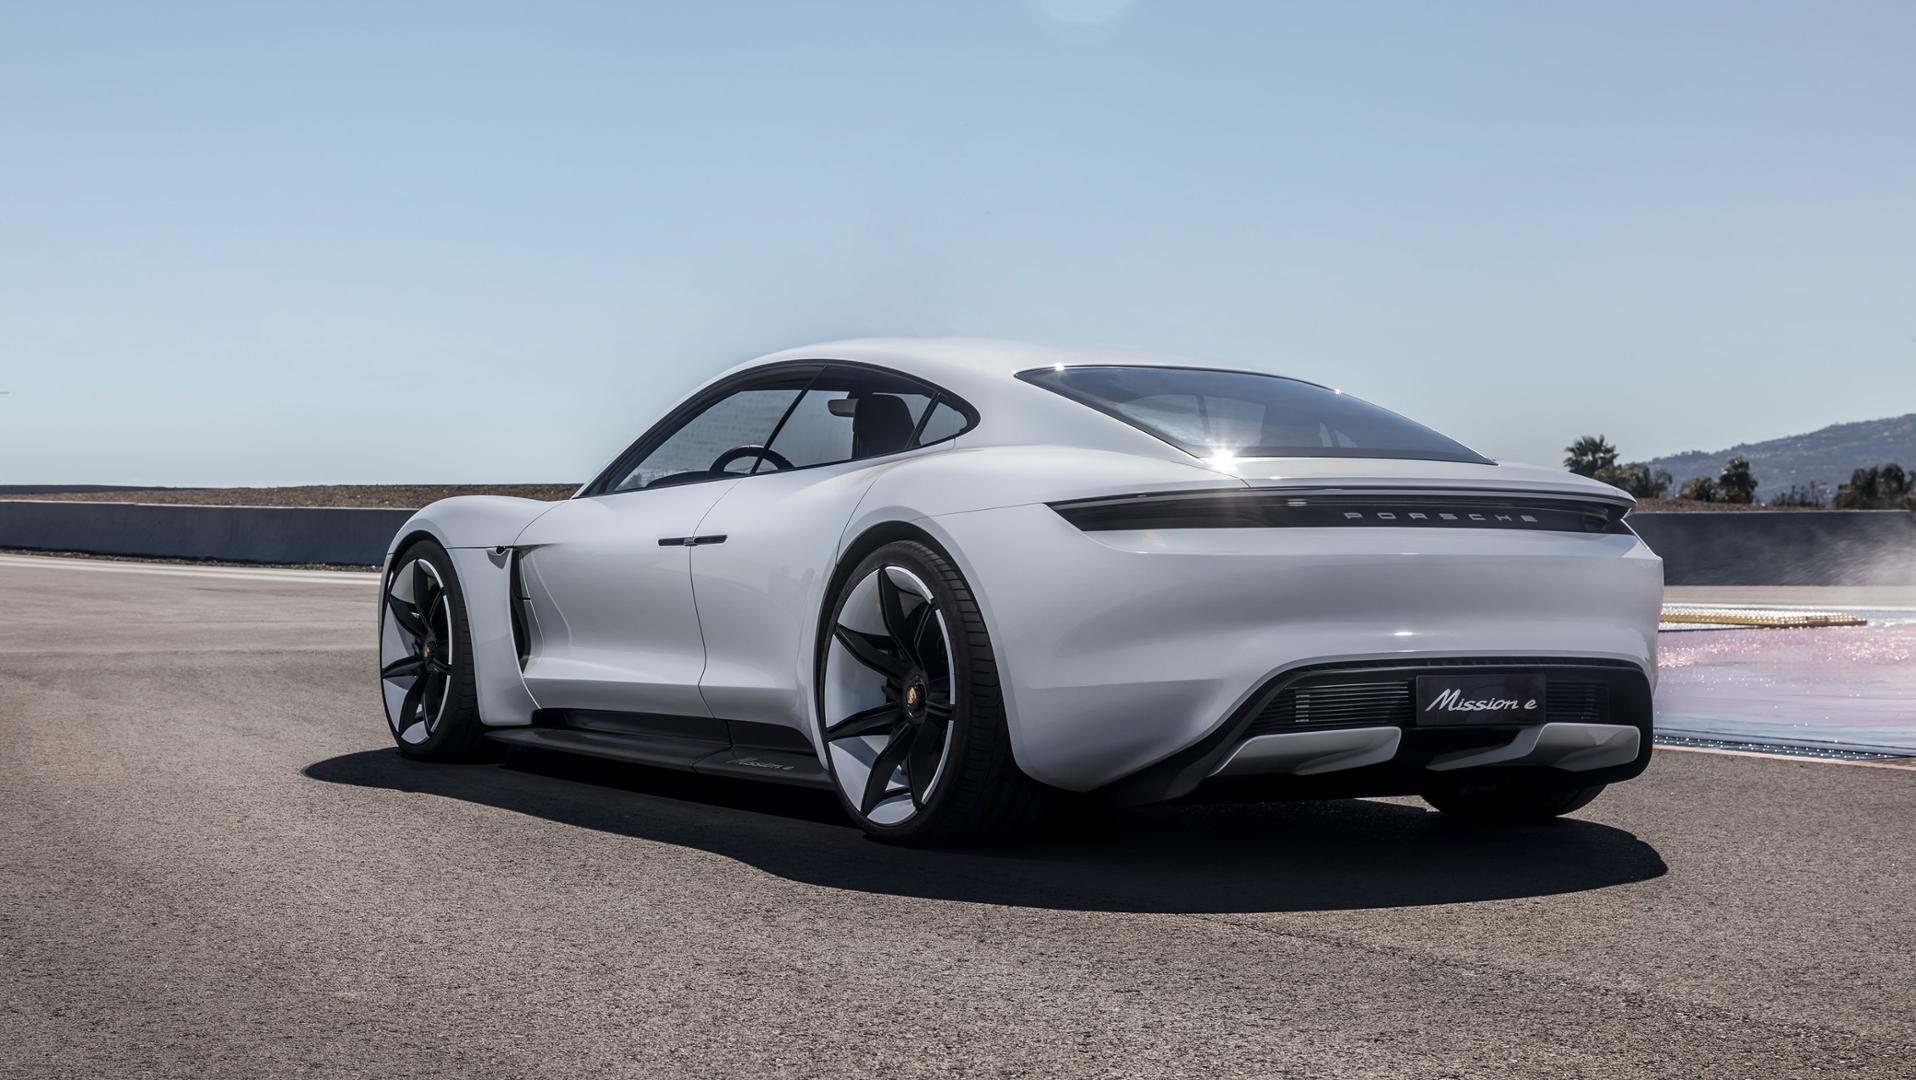 На фото: Технологические тенденции автомобилестроения в 2021 году, автор: admin